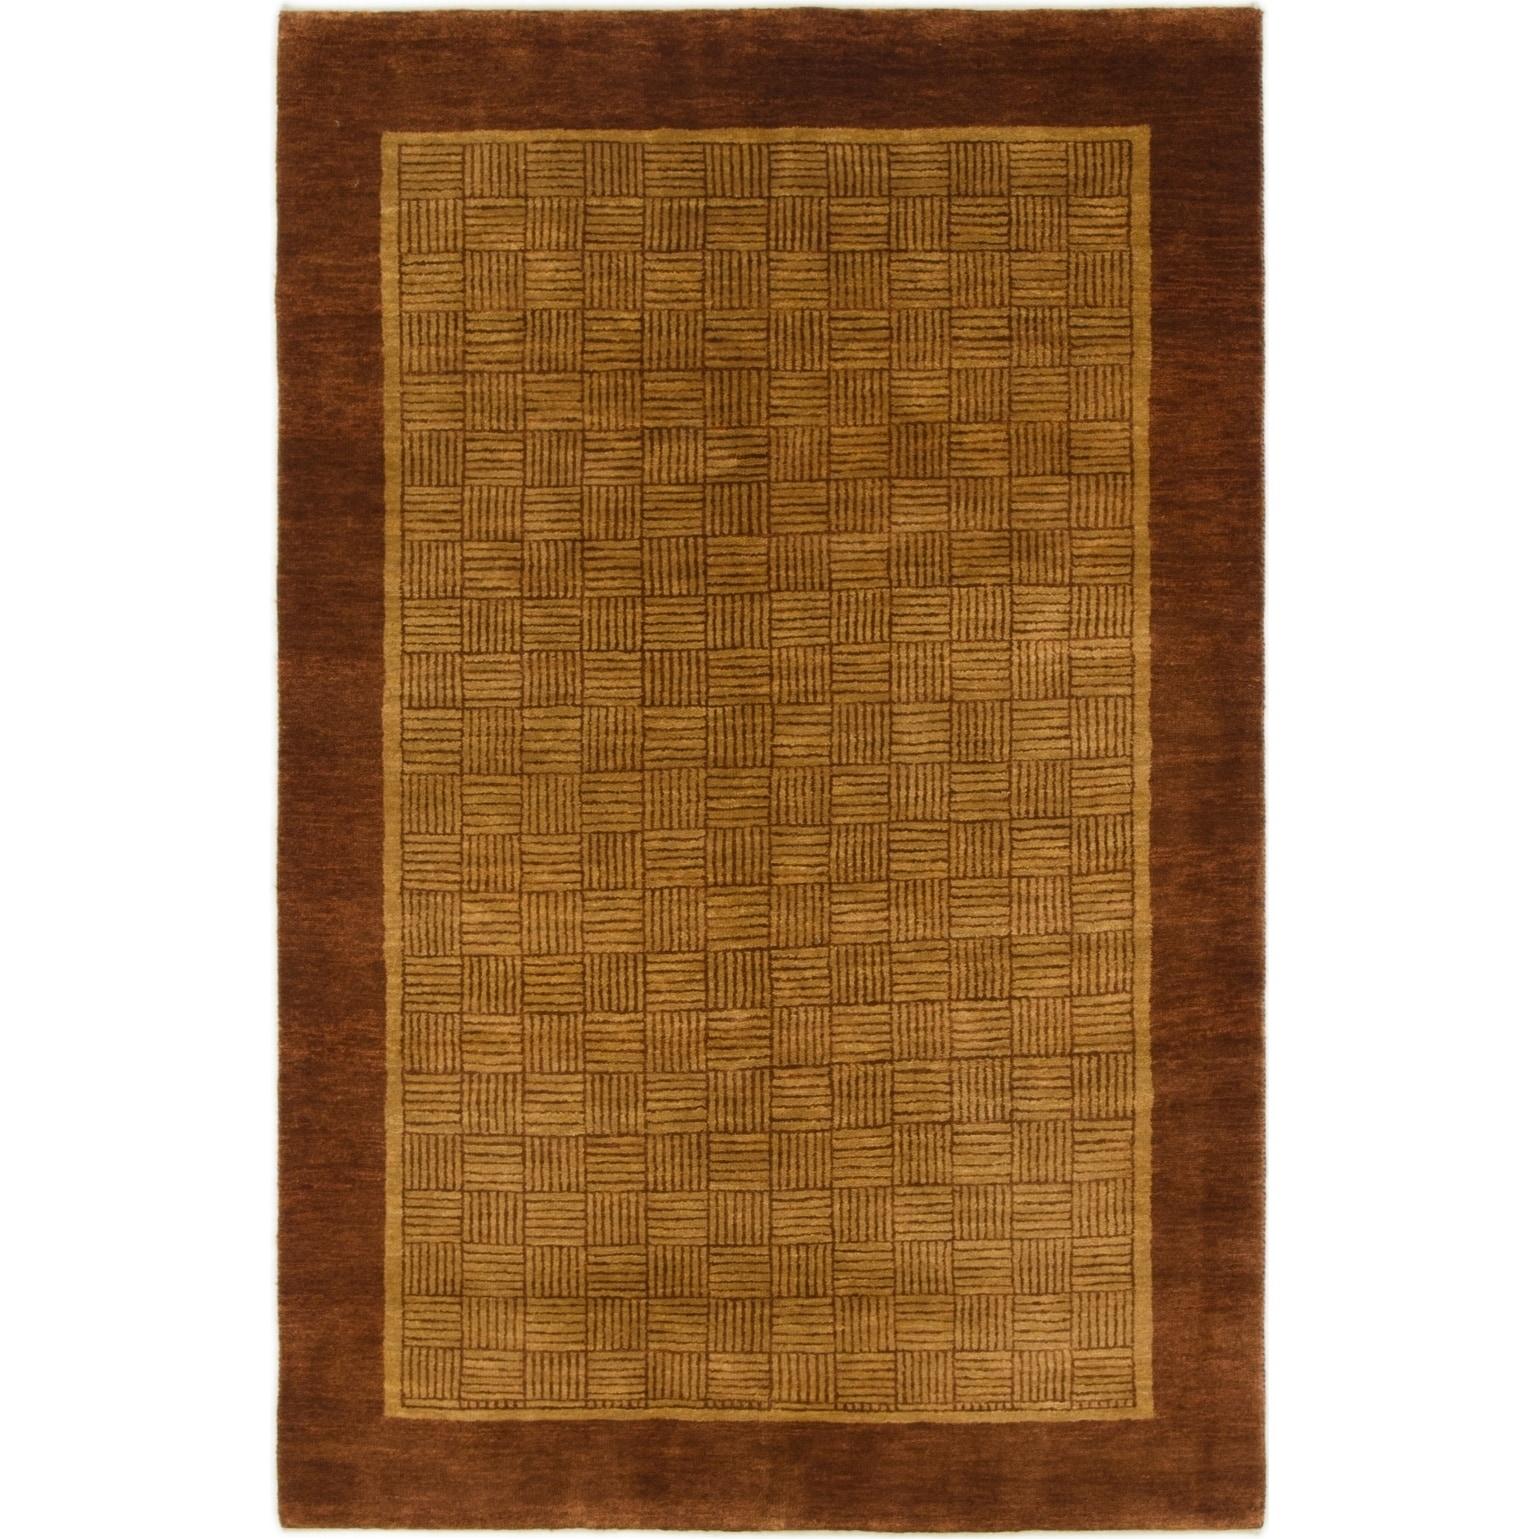 Hand Knotted Kashkuli Gabbeh Wool Area Rug - 3 10 x 6 1 (Beige - 3 10 x 6 1)